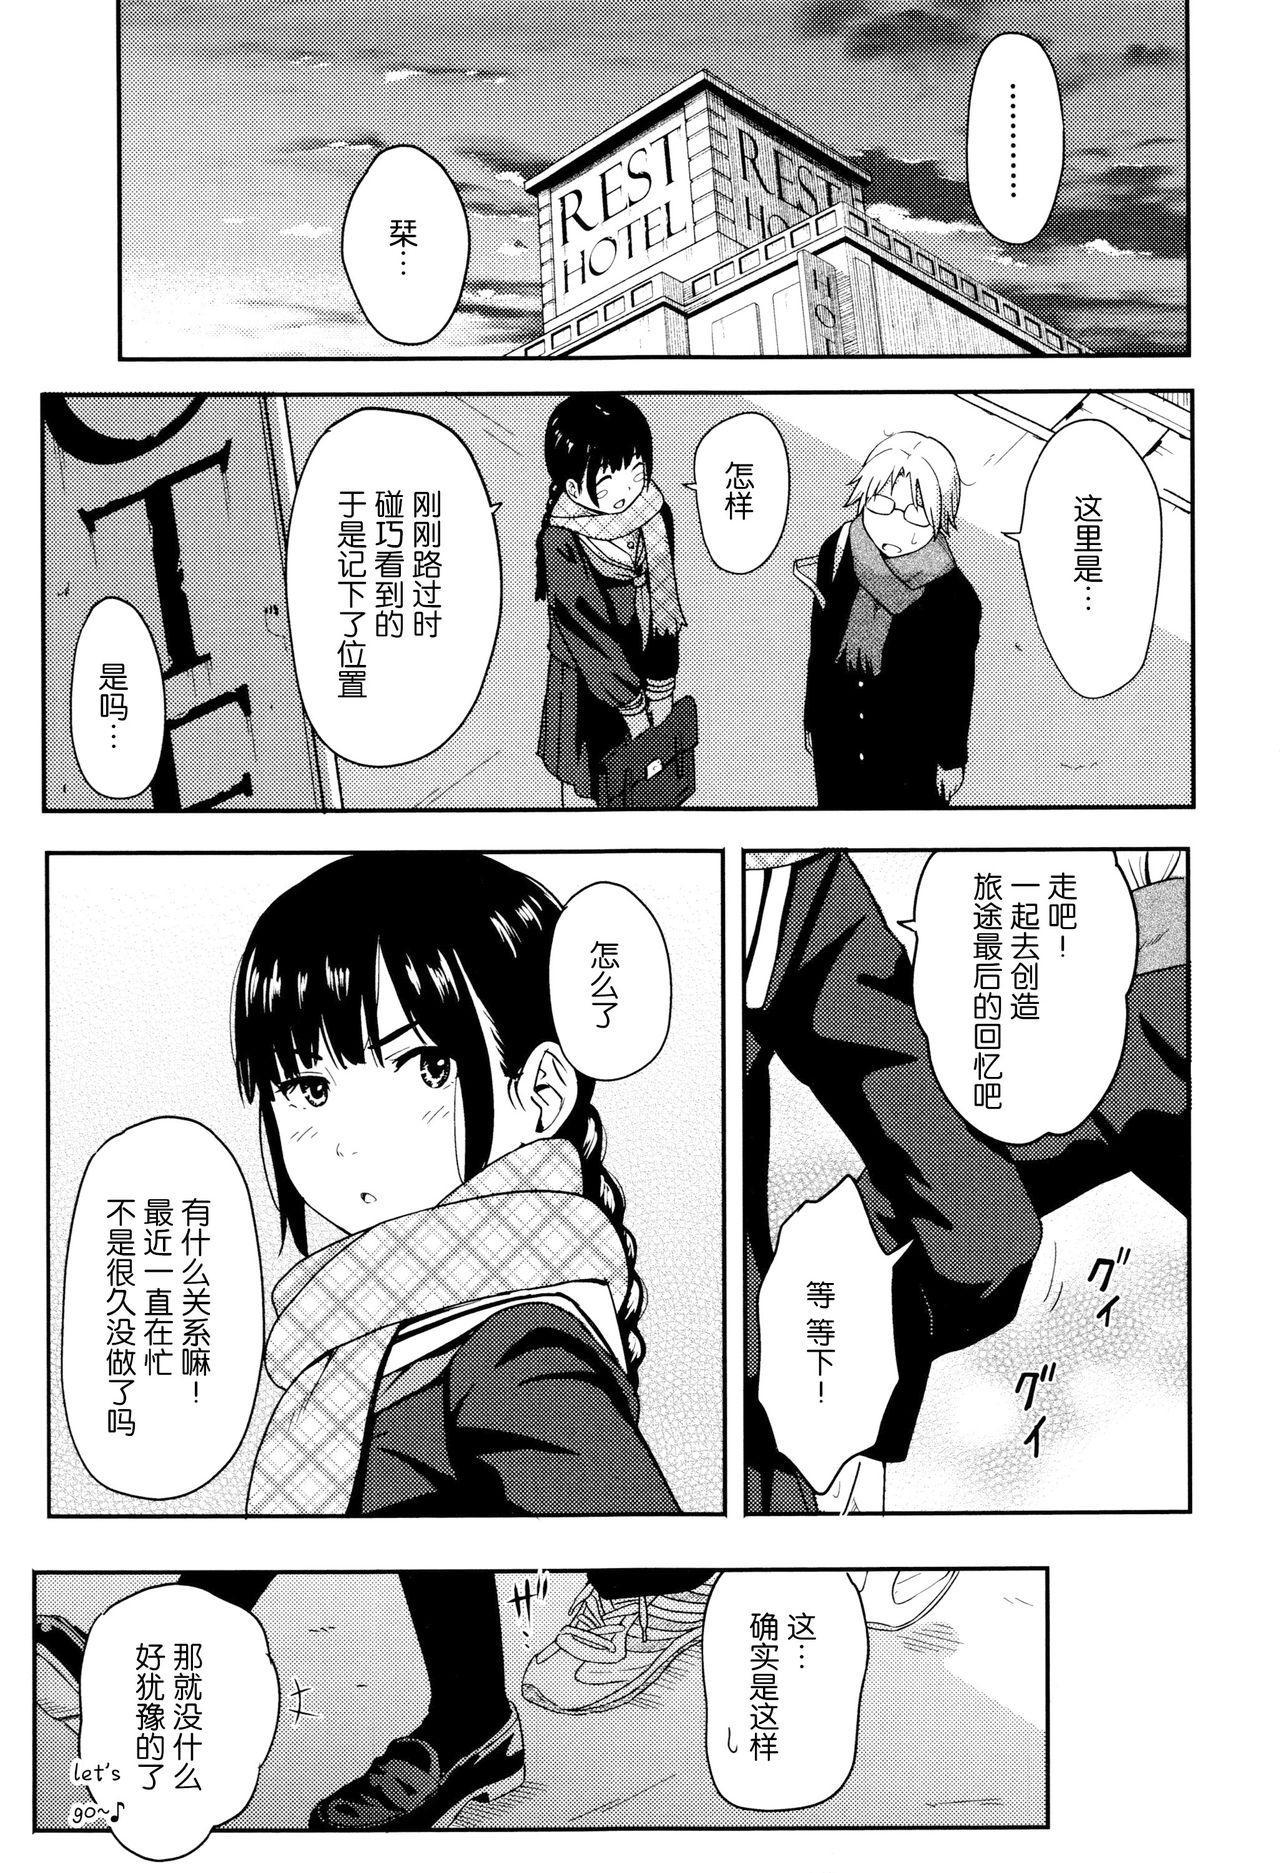 Tokubetsu na Mainichi - Special daily 99